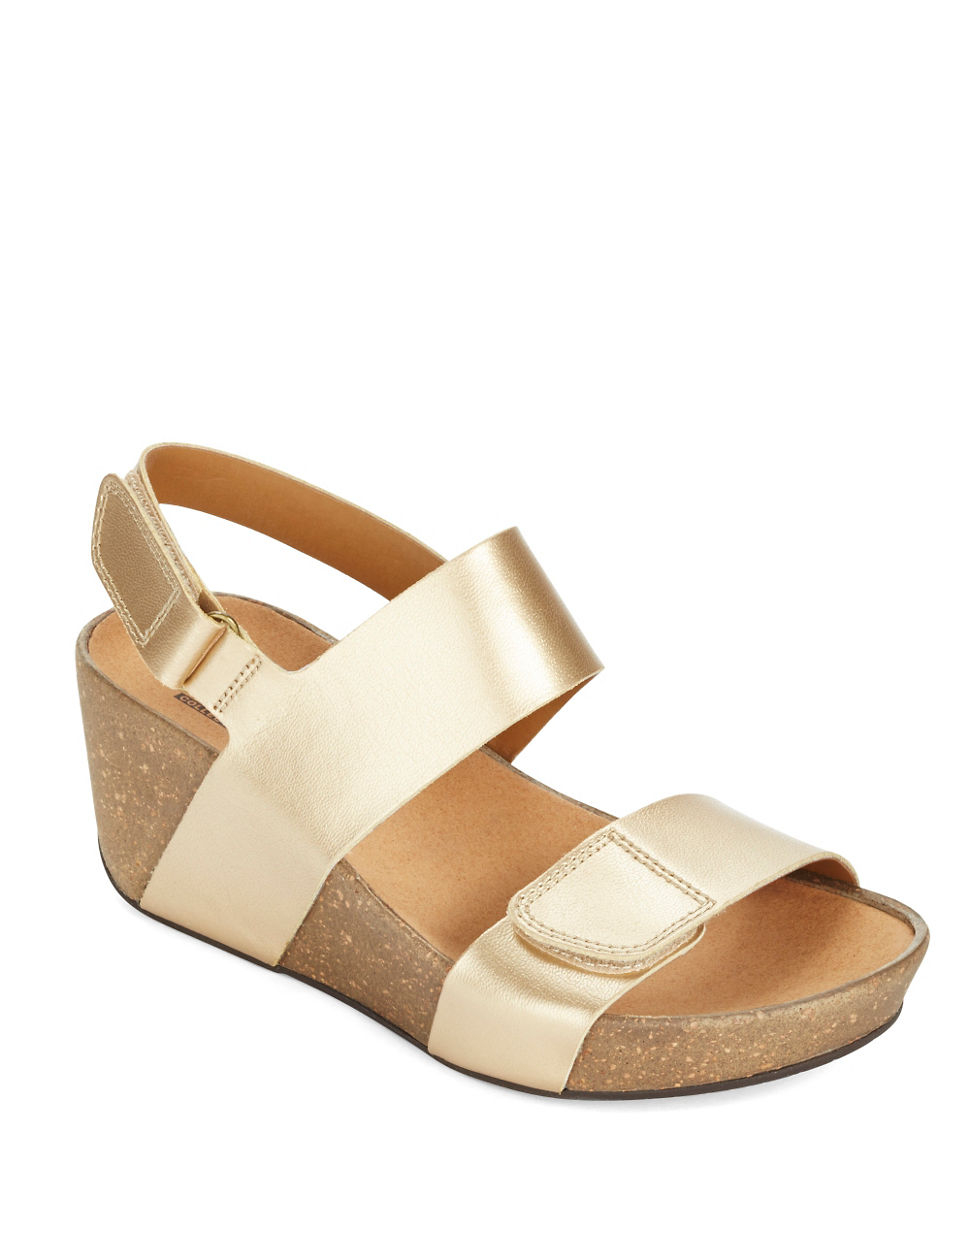 Clarks Auriel Fin Leather Wedge Sandals In Metallic Lyst